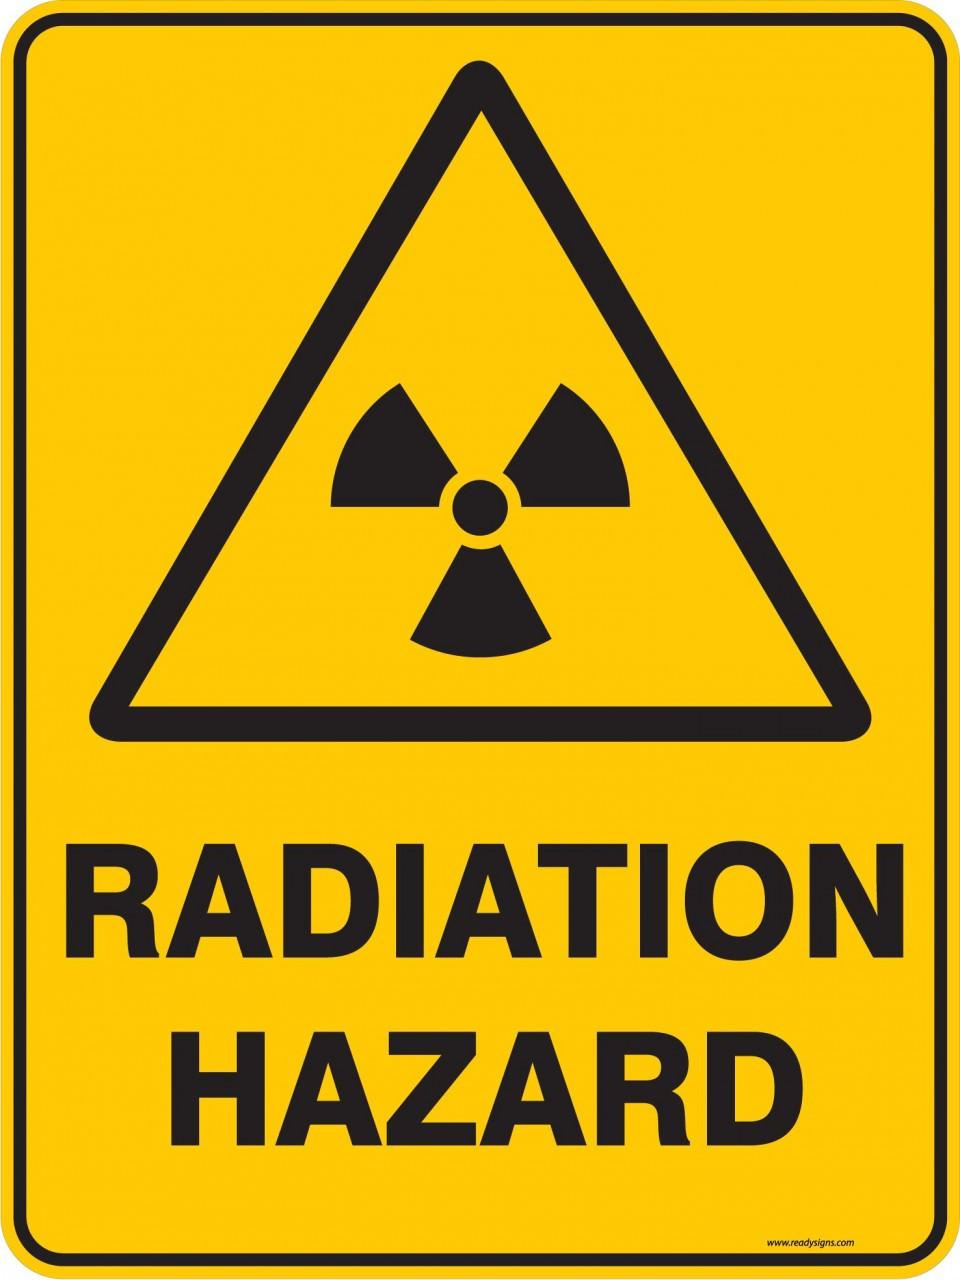 Warning Sign - RADIATION HAZARD - Ready Signs